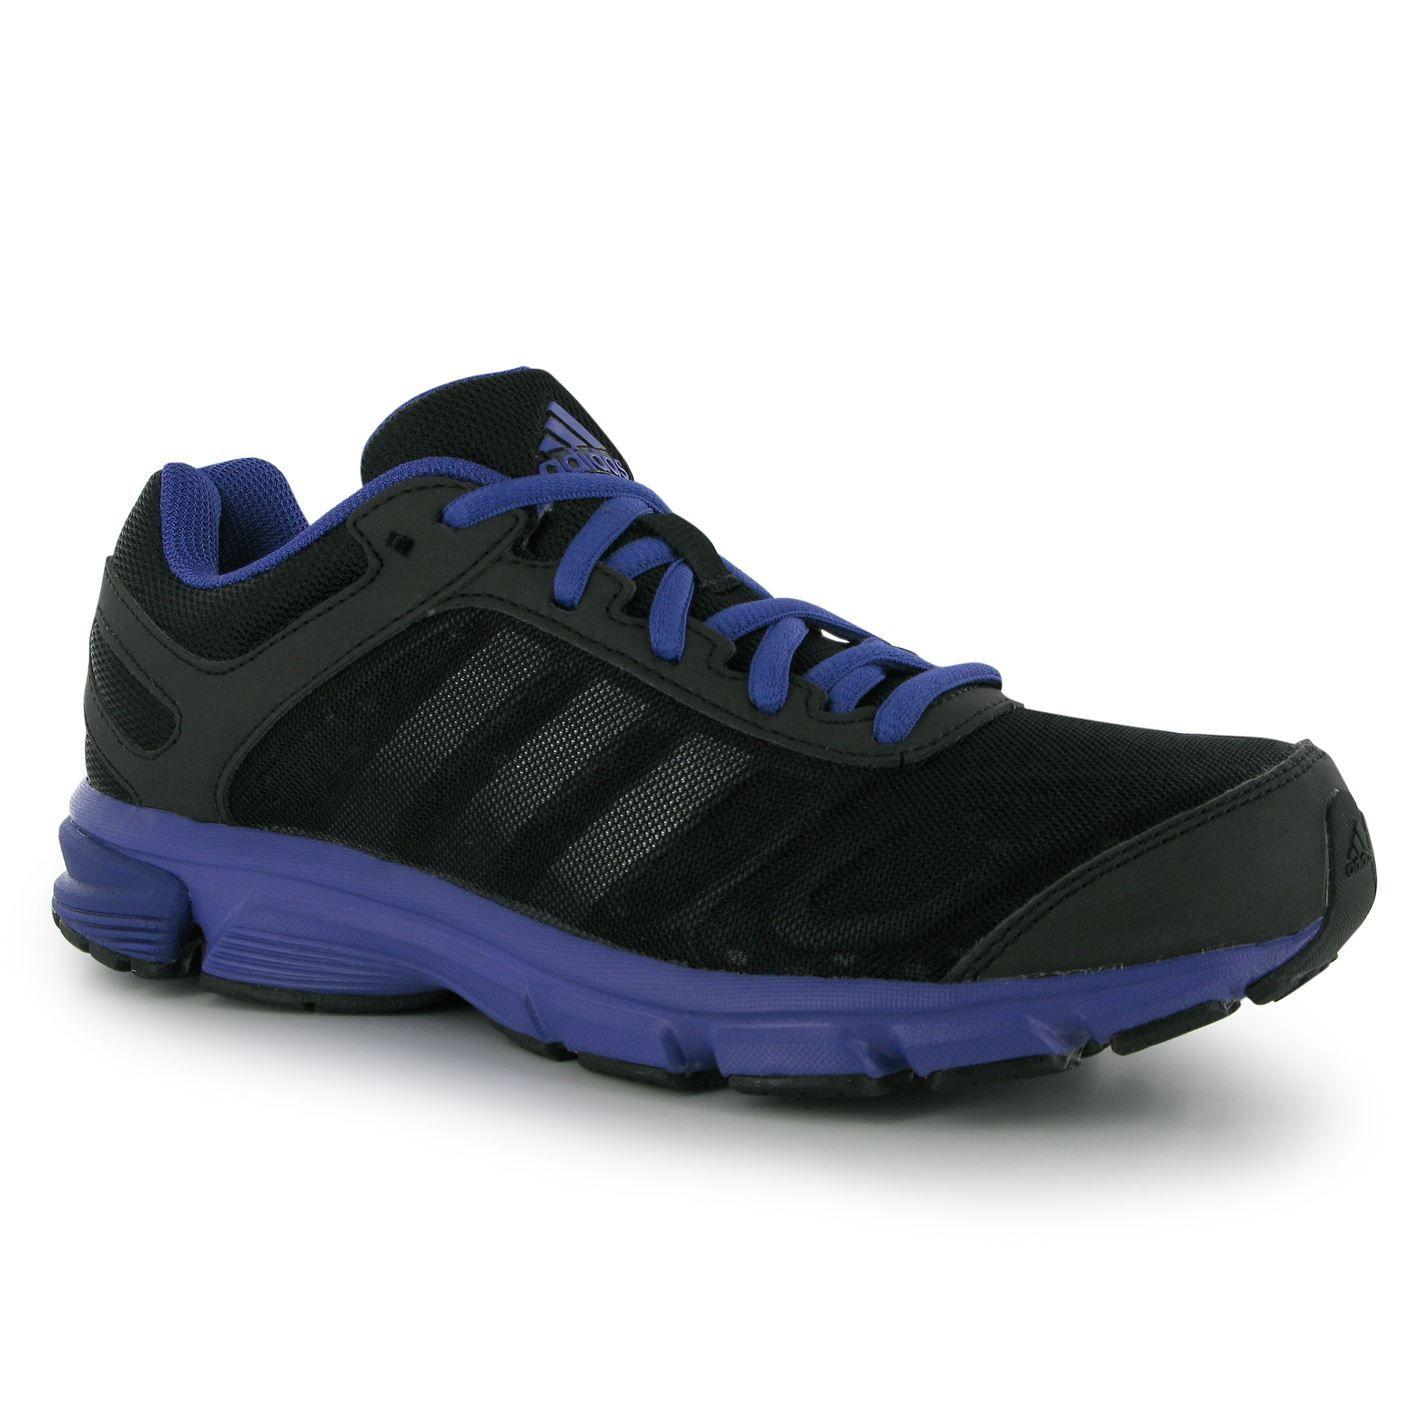 Excretar blanco lechoso Apariencia  adidas | adidas Exerta 2 Ladies Running Shoes | Running Shoes | Womens  running shoes, Shoes, Running shoes